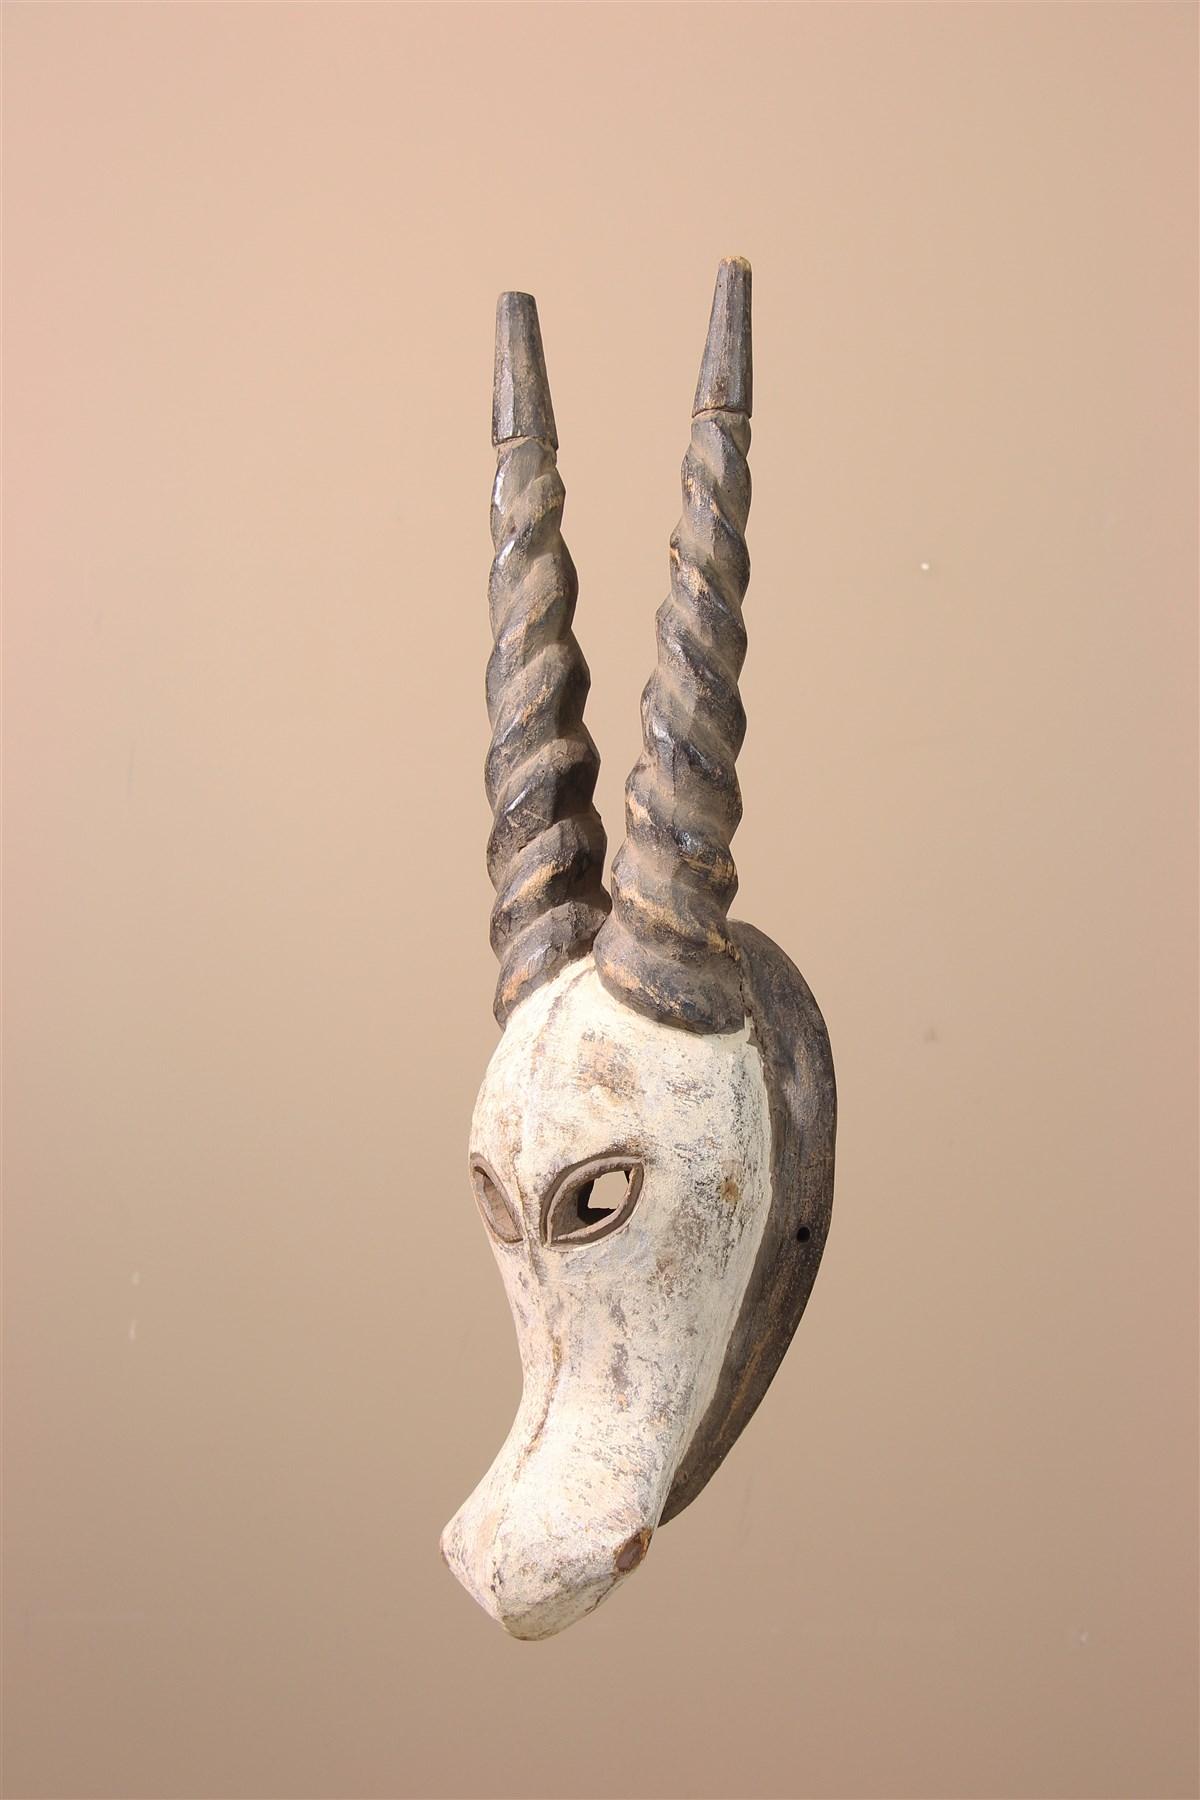 Masque africain Kwélé du Gabon - Déco africaine - Art africain traditionnel